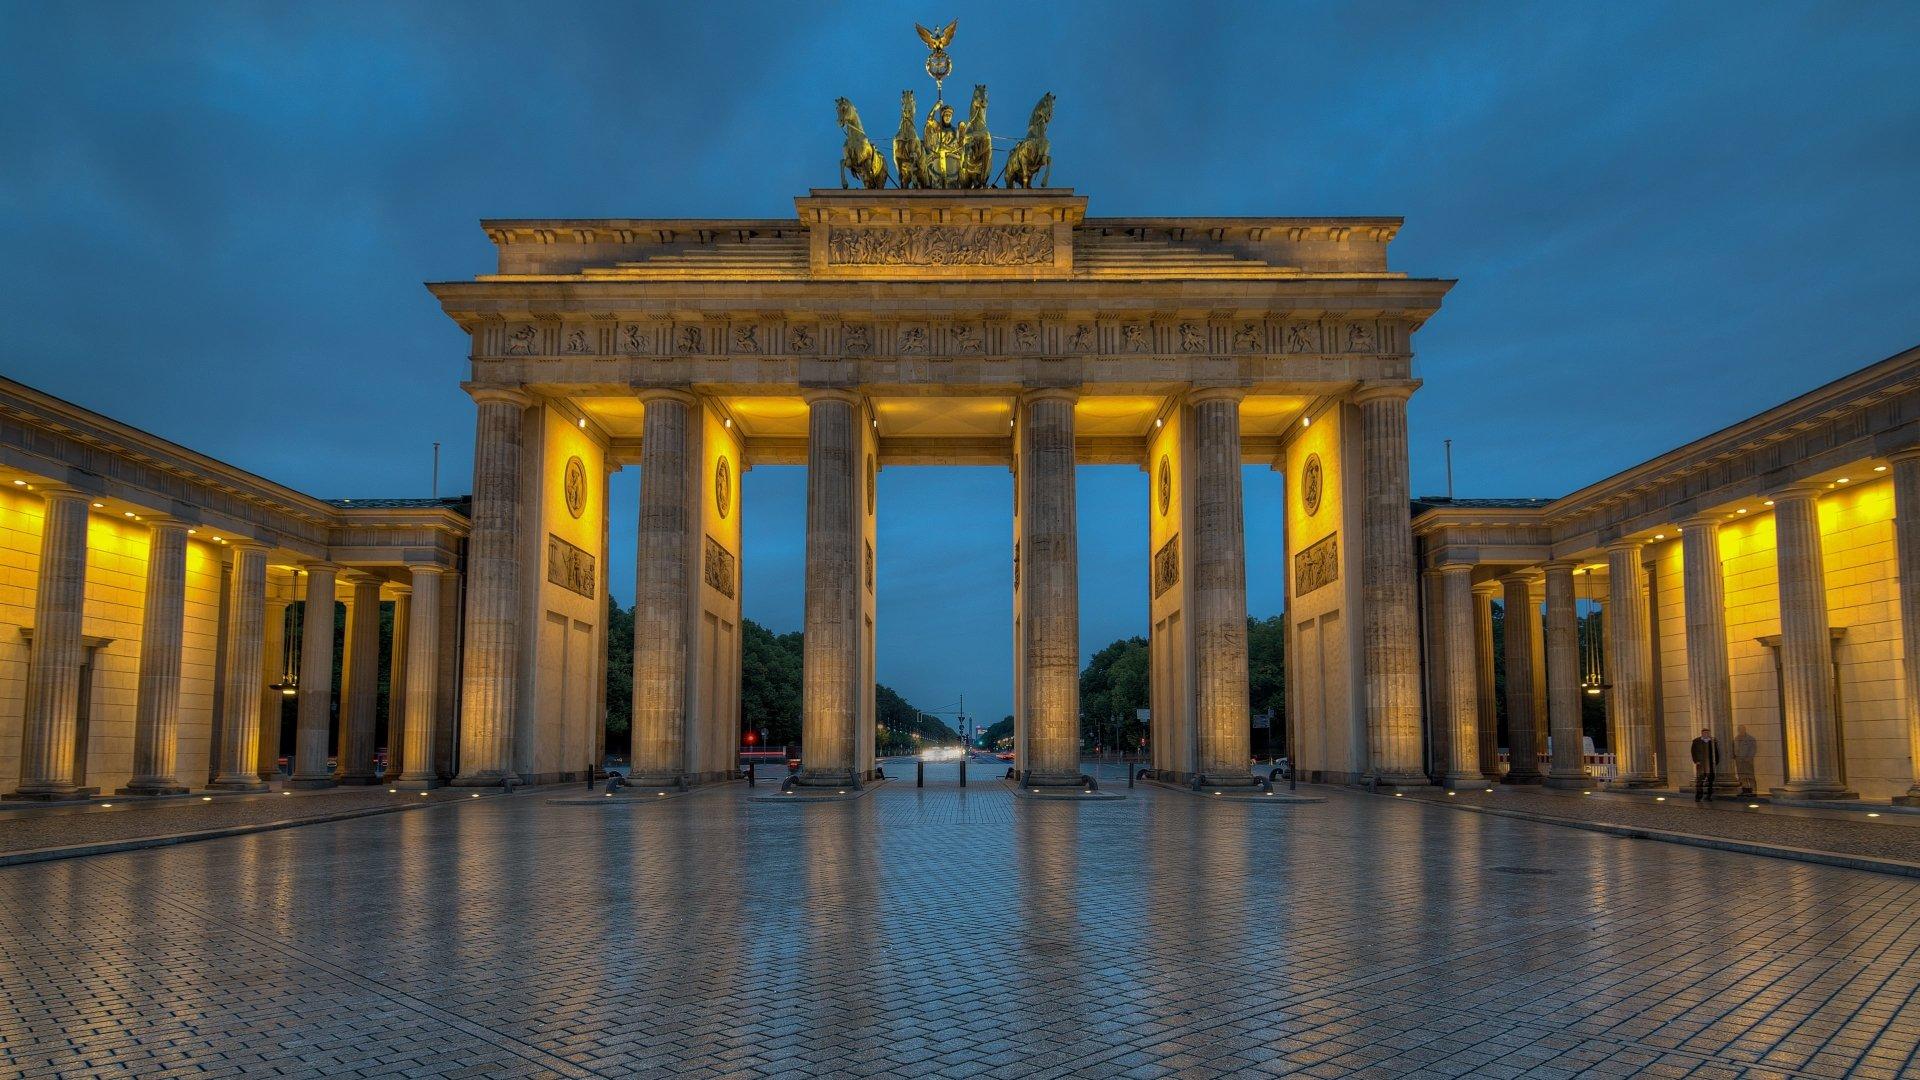 15 Brandenburg Gate HD Wallpapers Background Images   Wallpaper 1920x1080